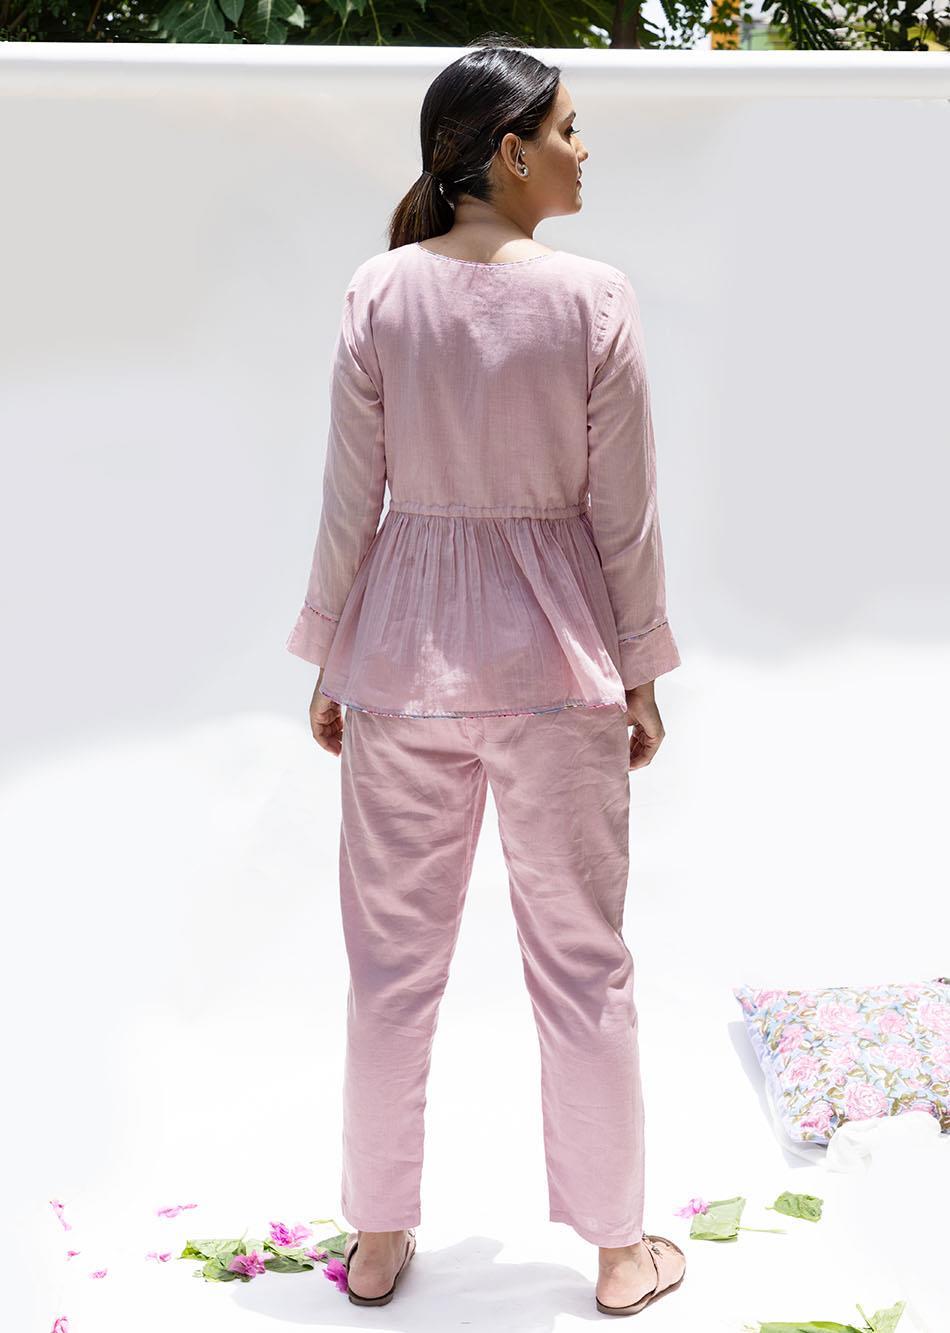 Gulabi gathered top and pant (set of 2) By Jovi Fashion